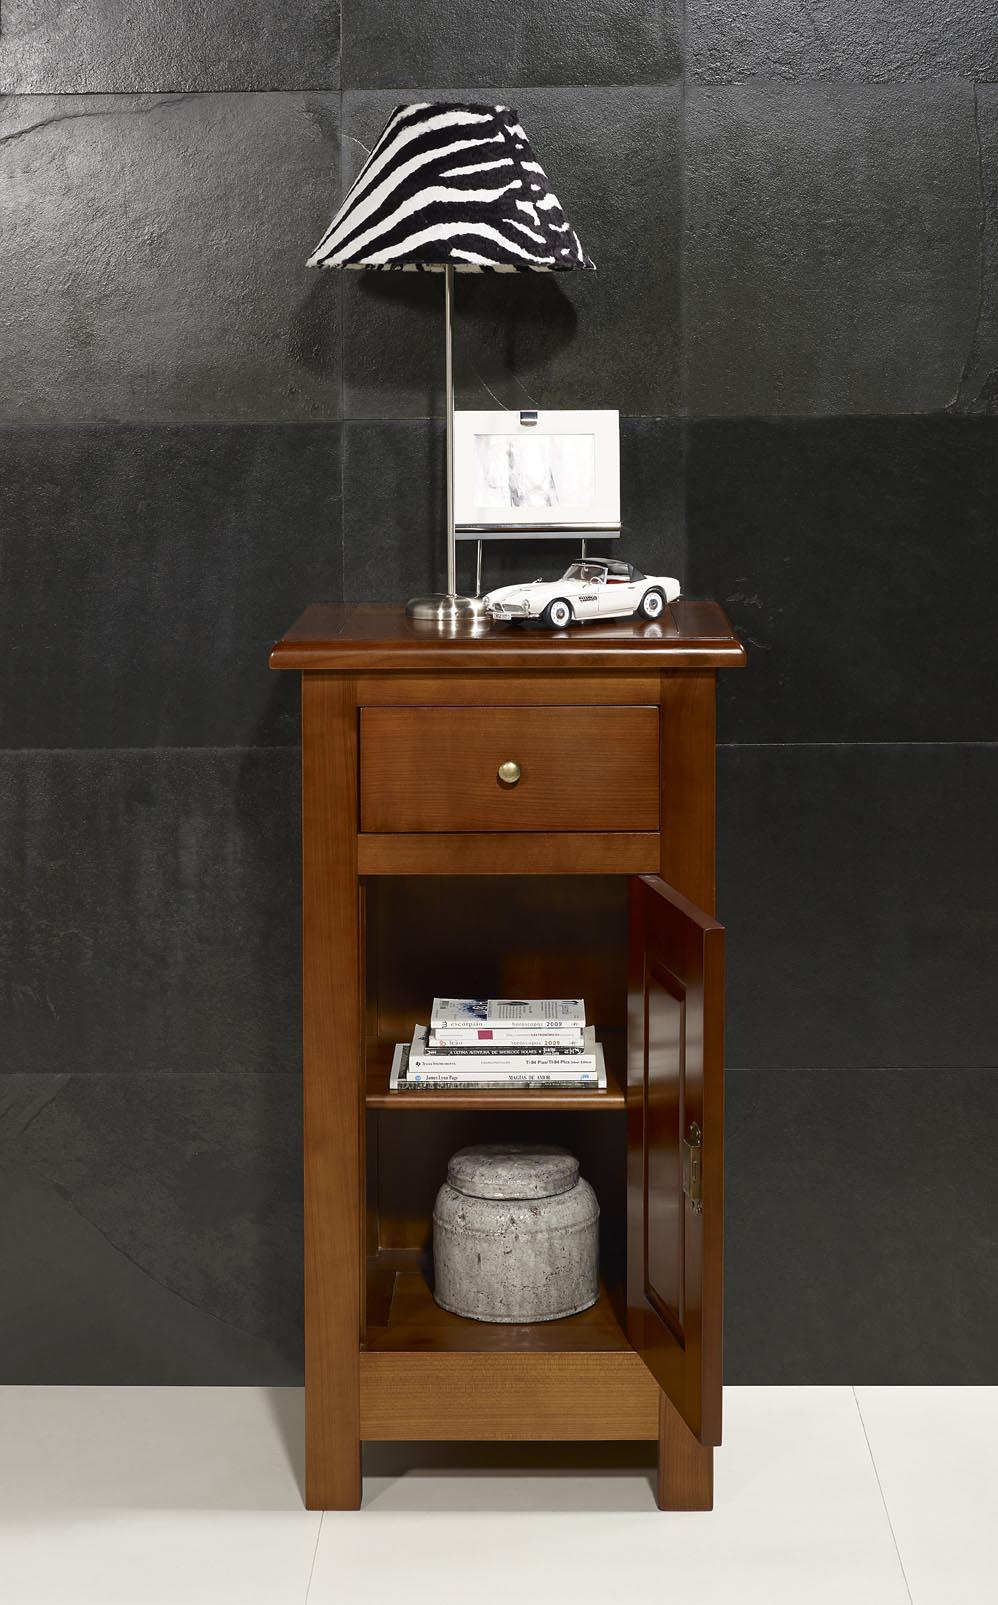 meuble t l phone en merisier massif de style campagne. Black Bedroom Furniture Sets. Home Design Ideas